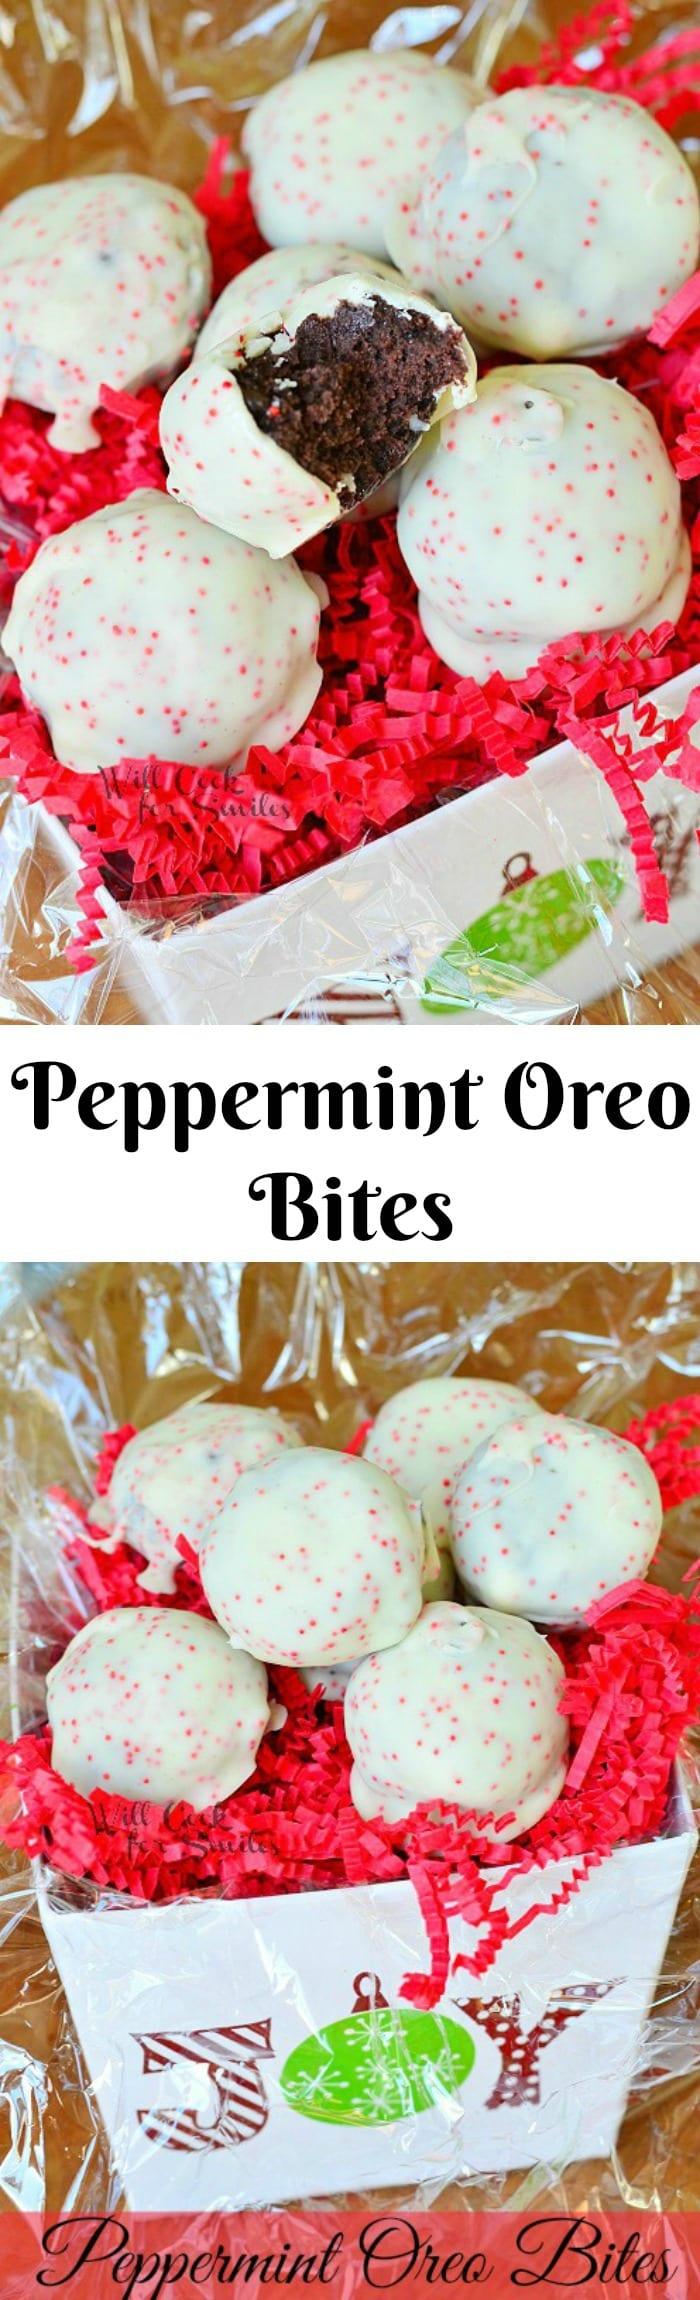 Peppermint Oreo Bites